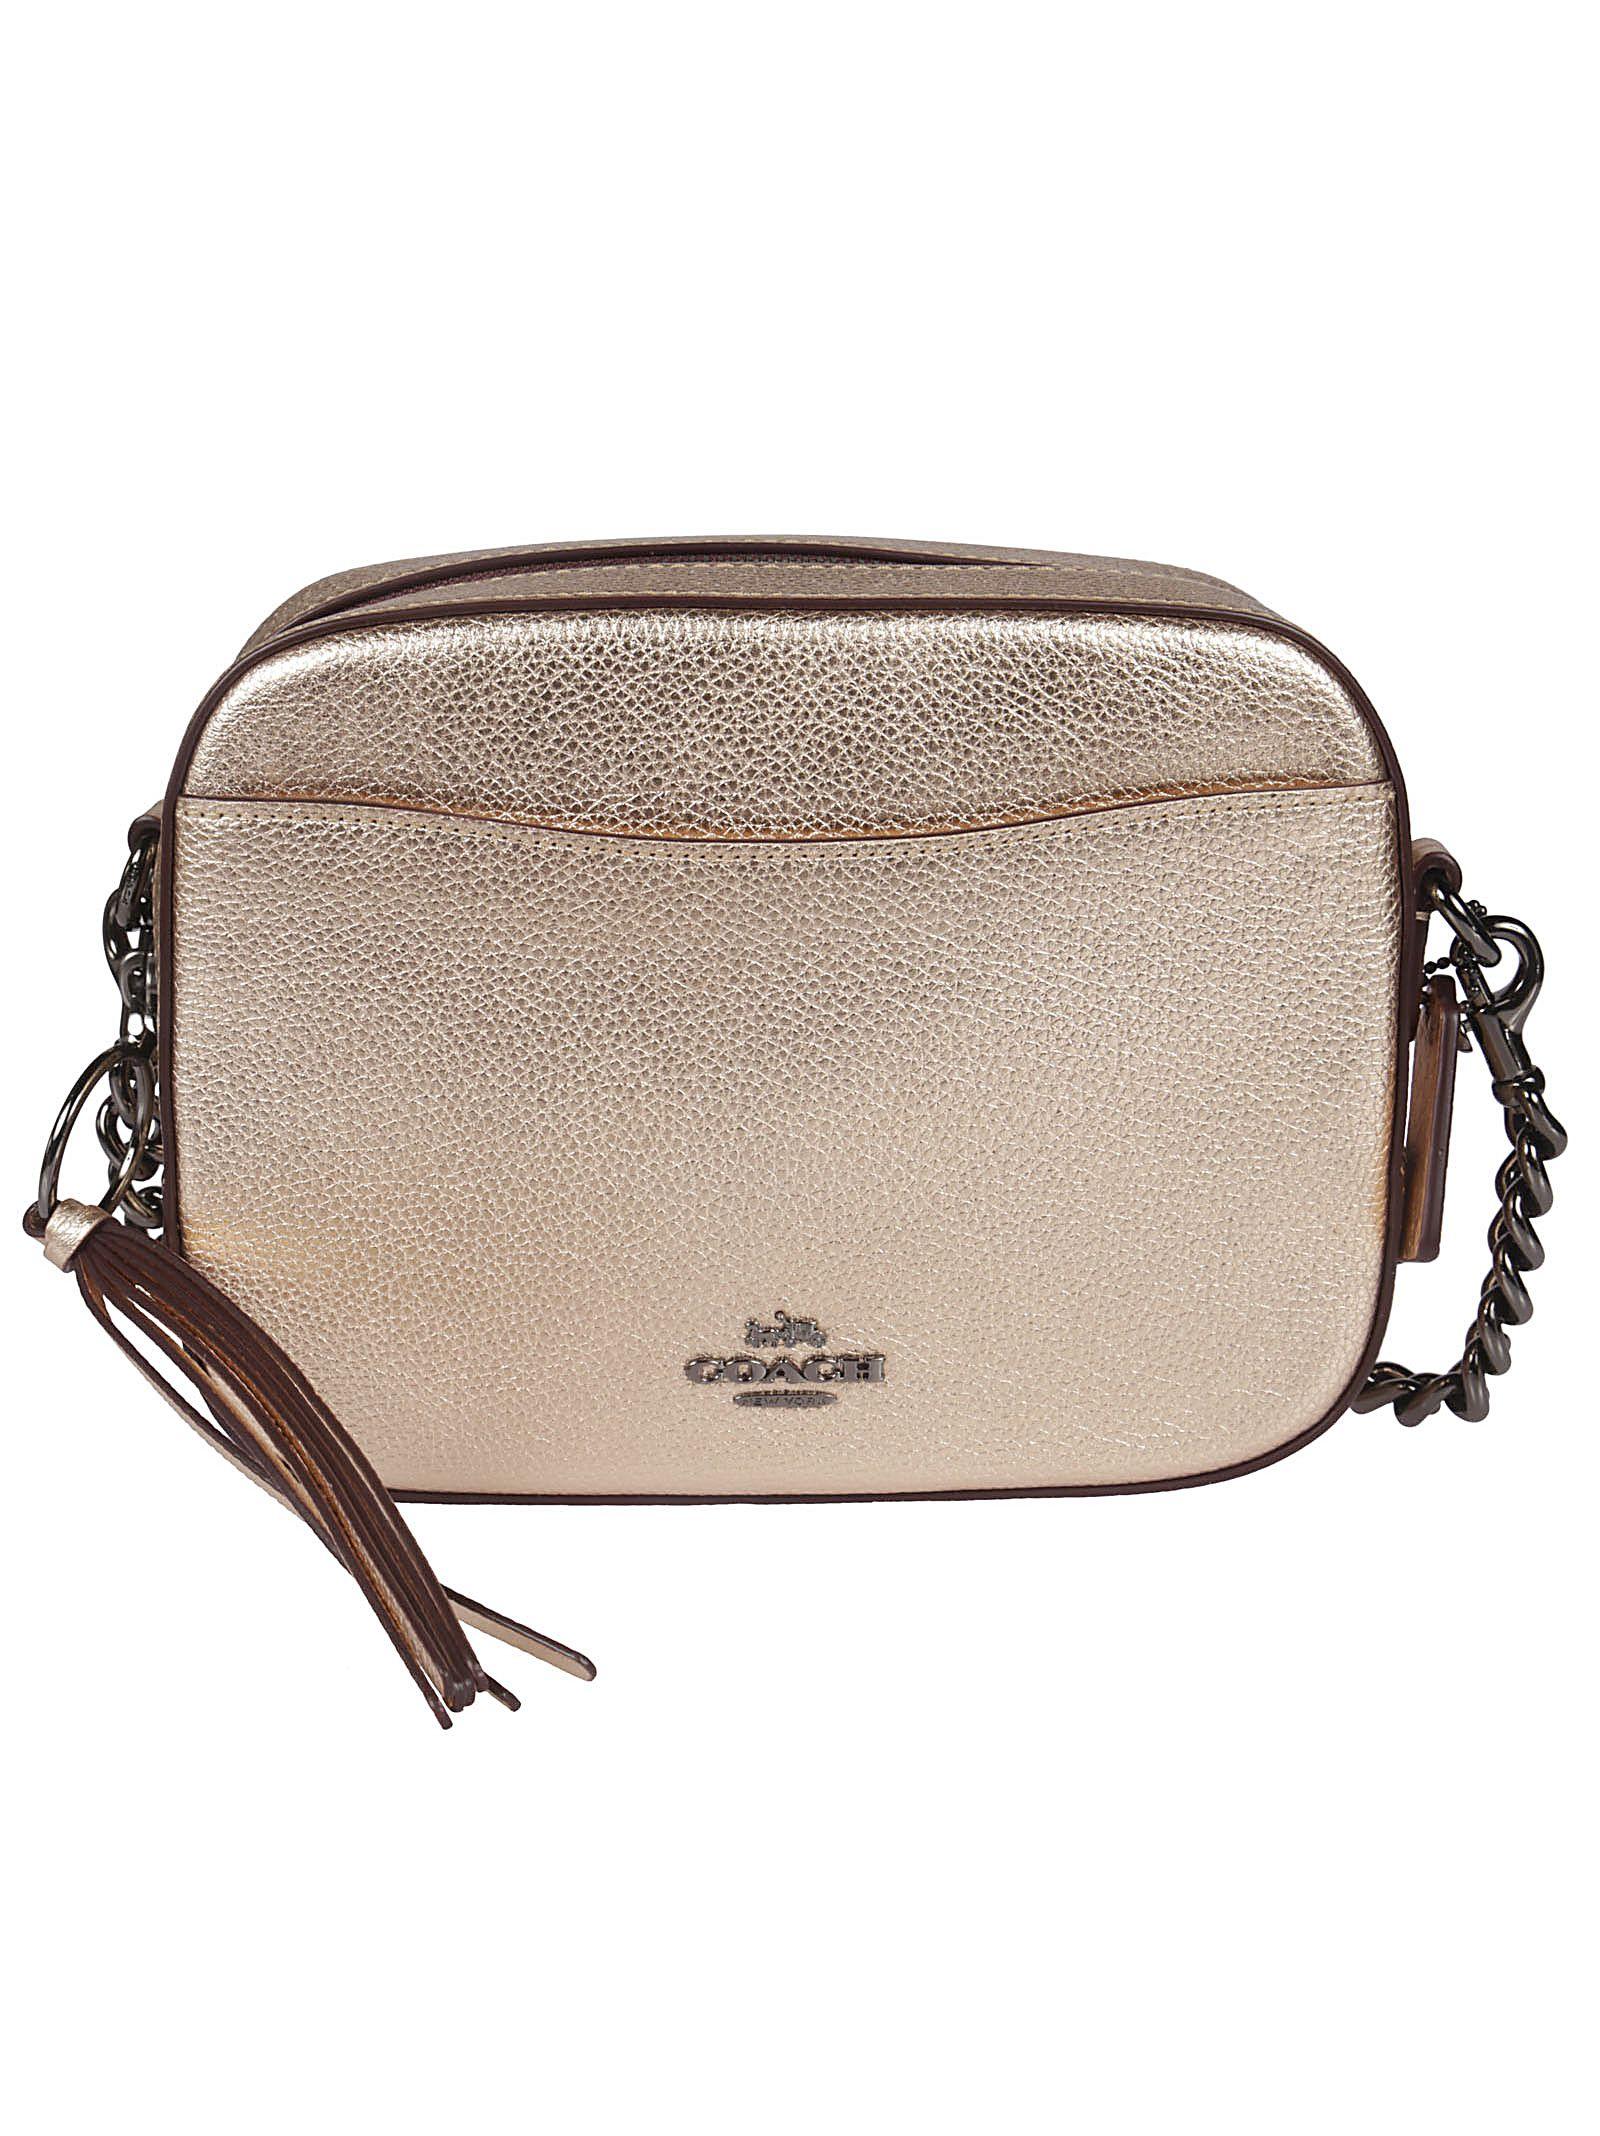 Coach Logo Plaque Shoulder Bag